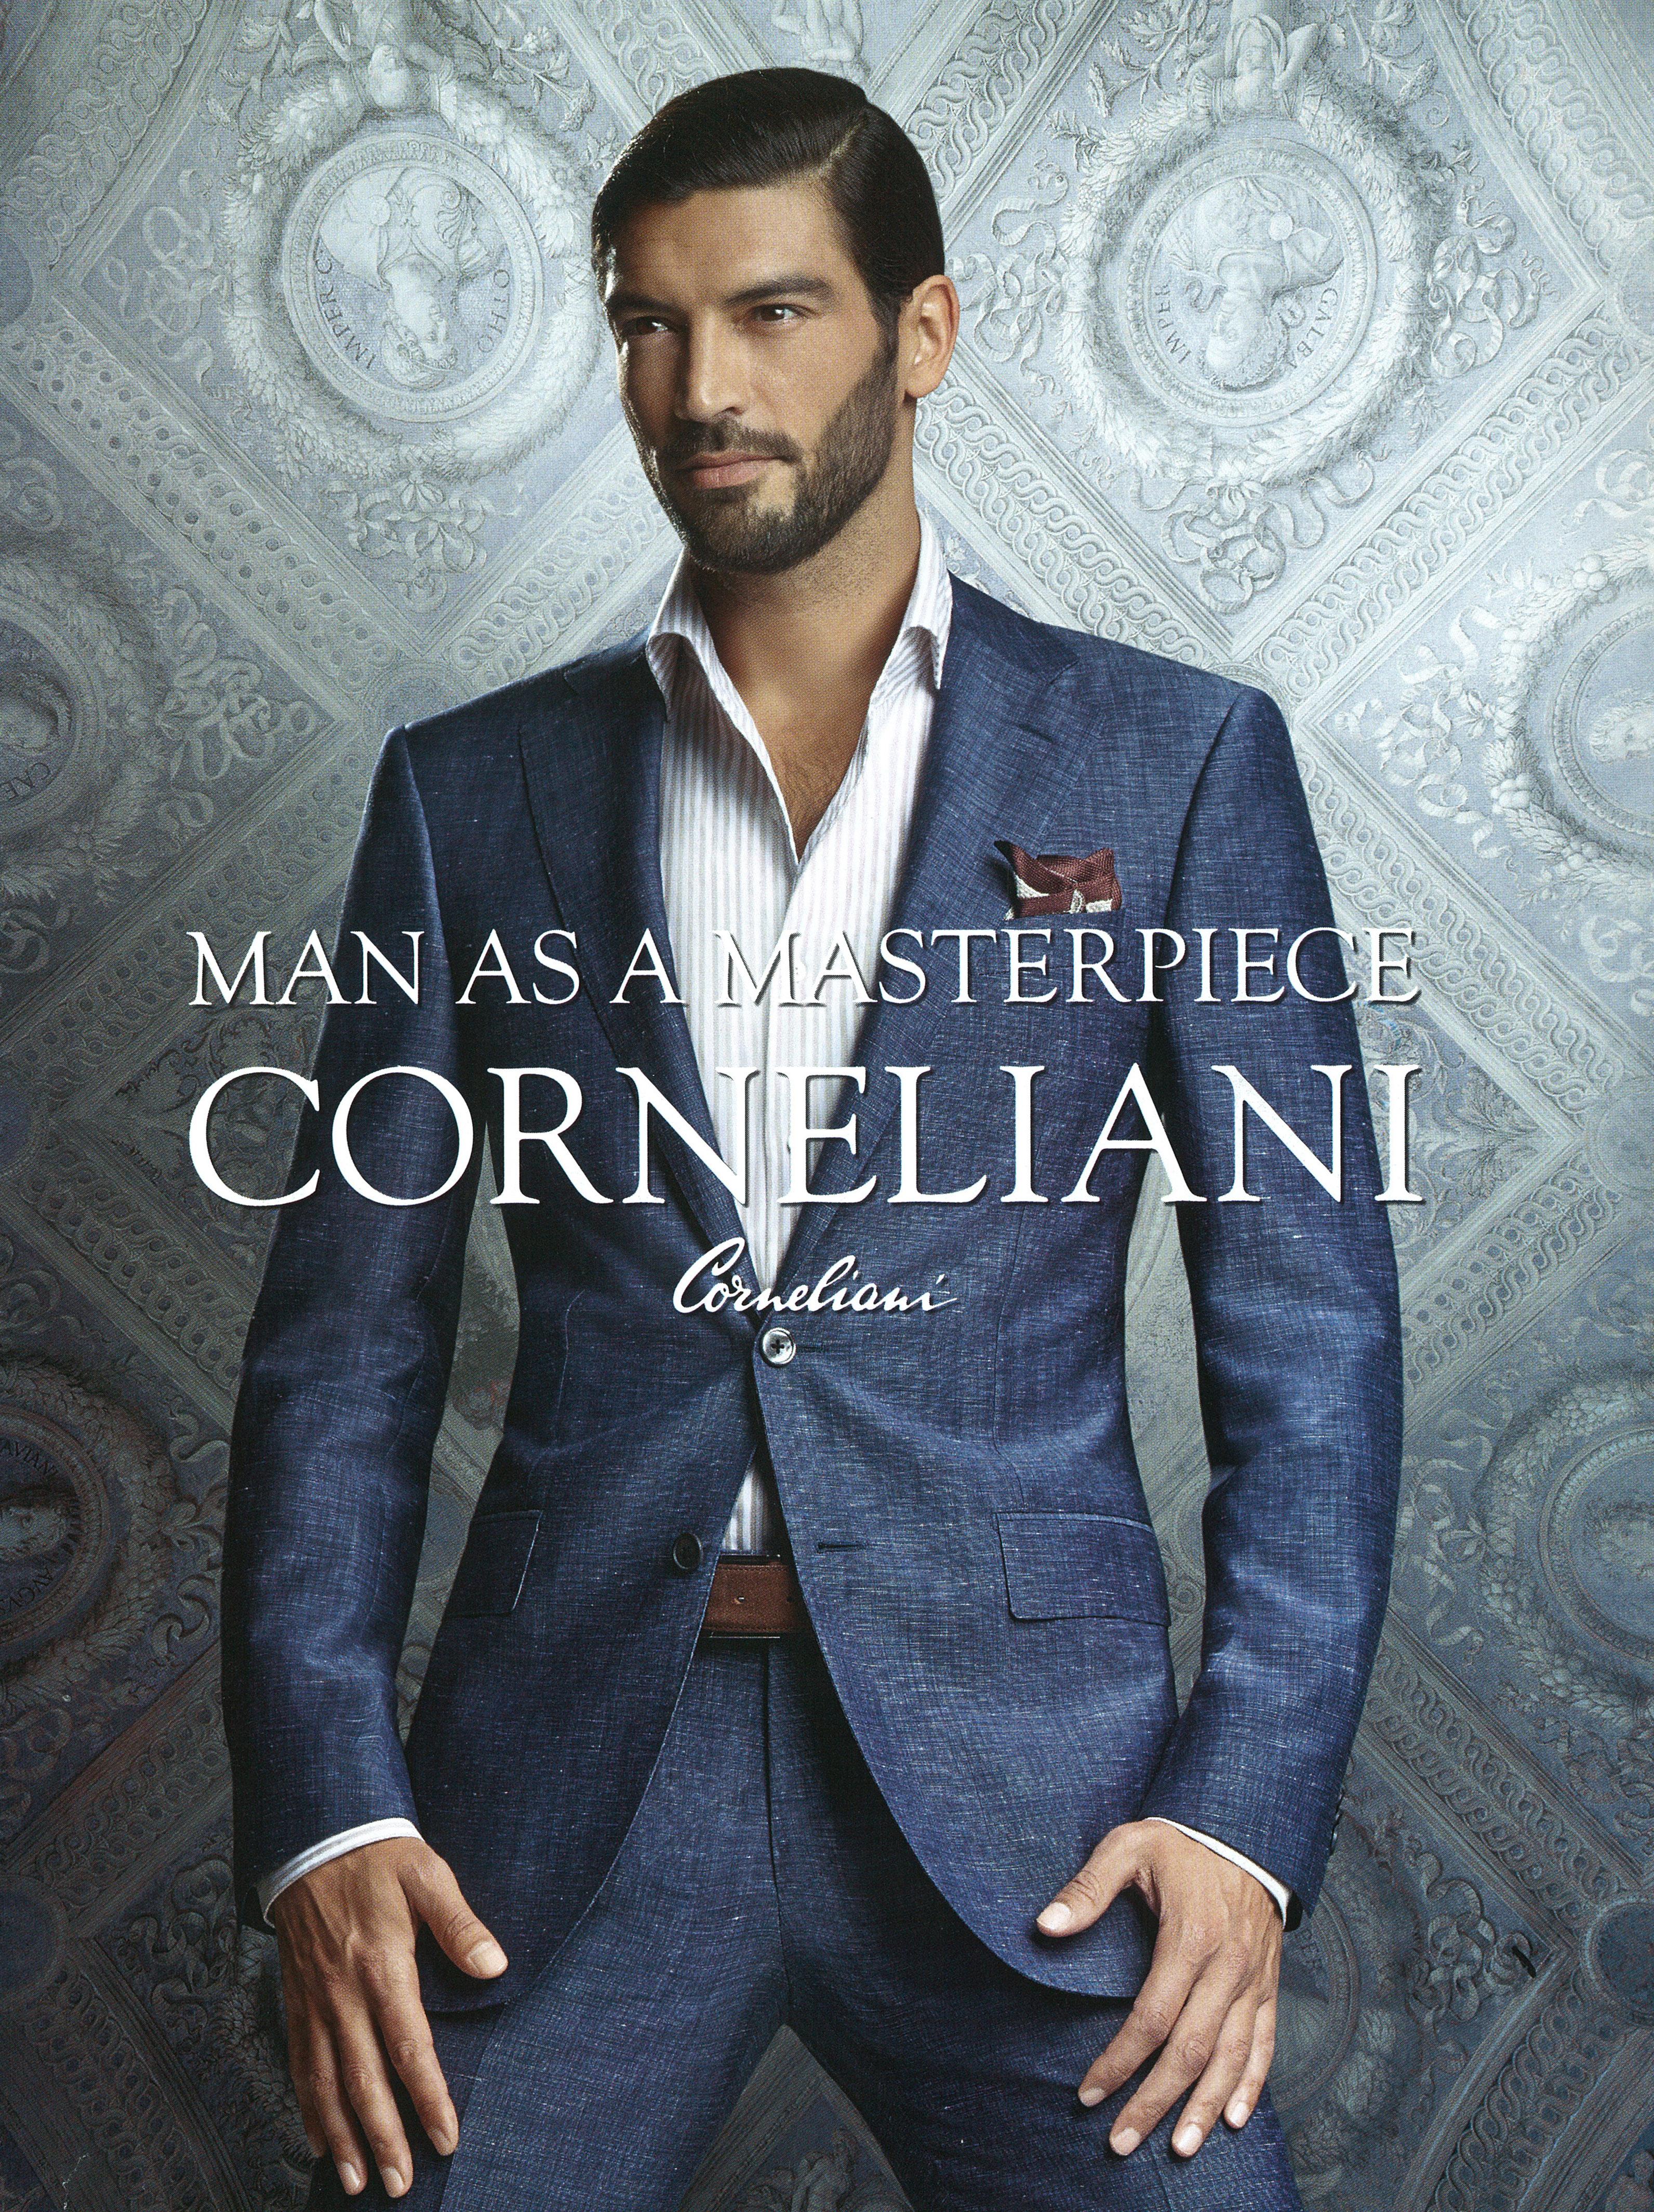 Corneliani Spring/Summer 2014 Campaign Featuring Clement Barreda